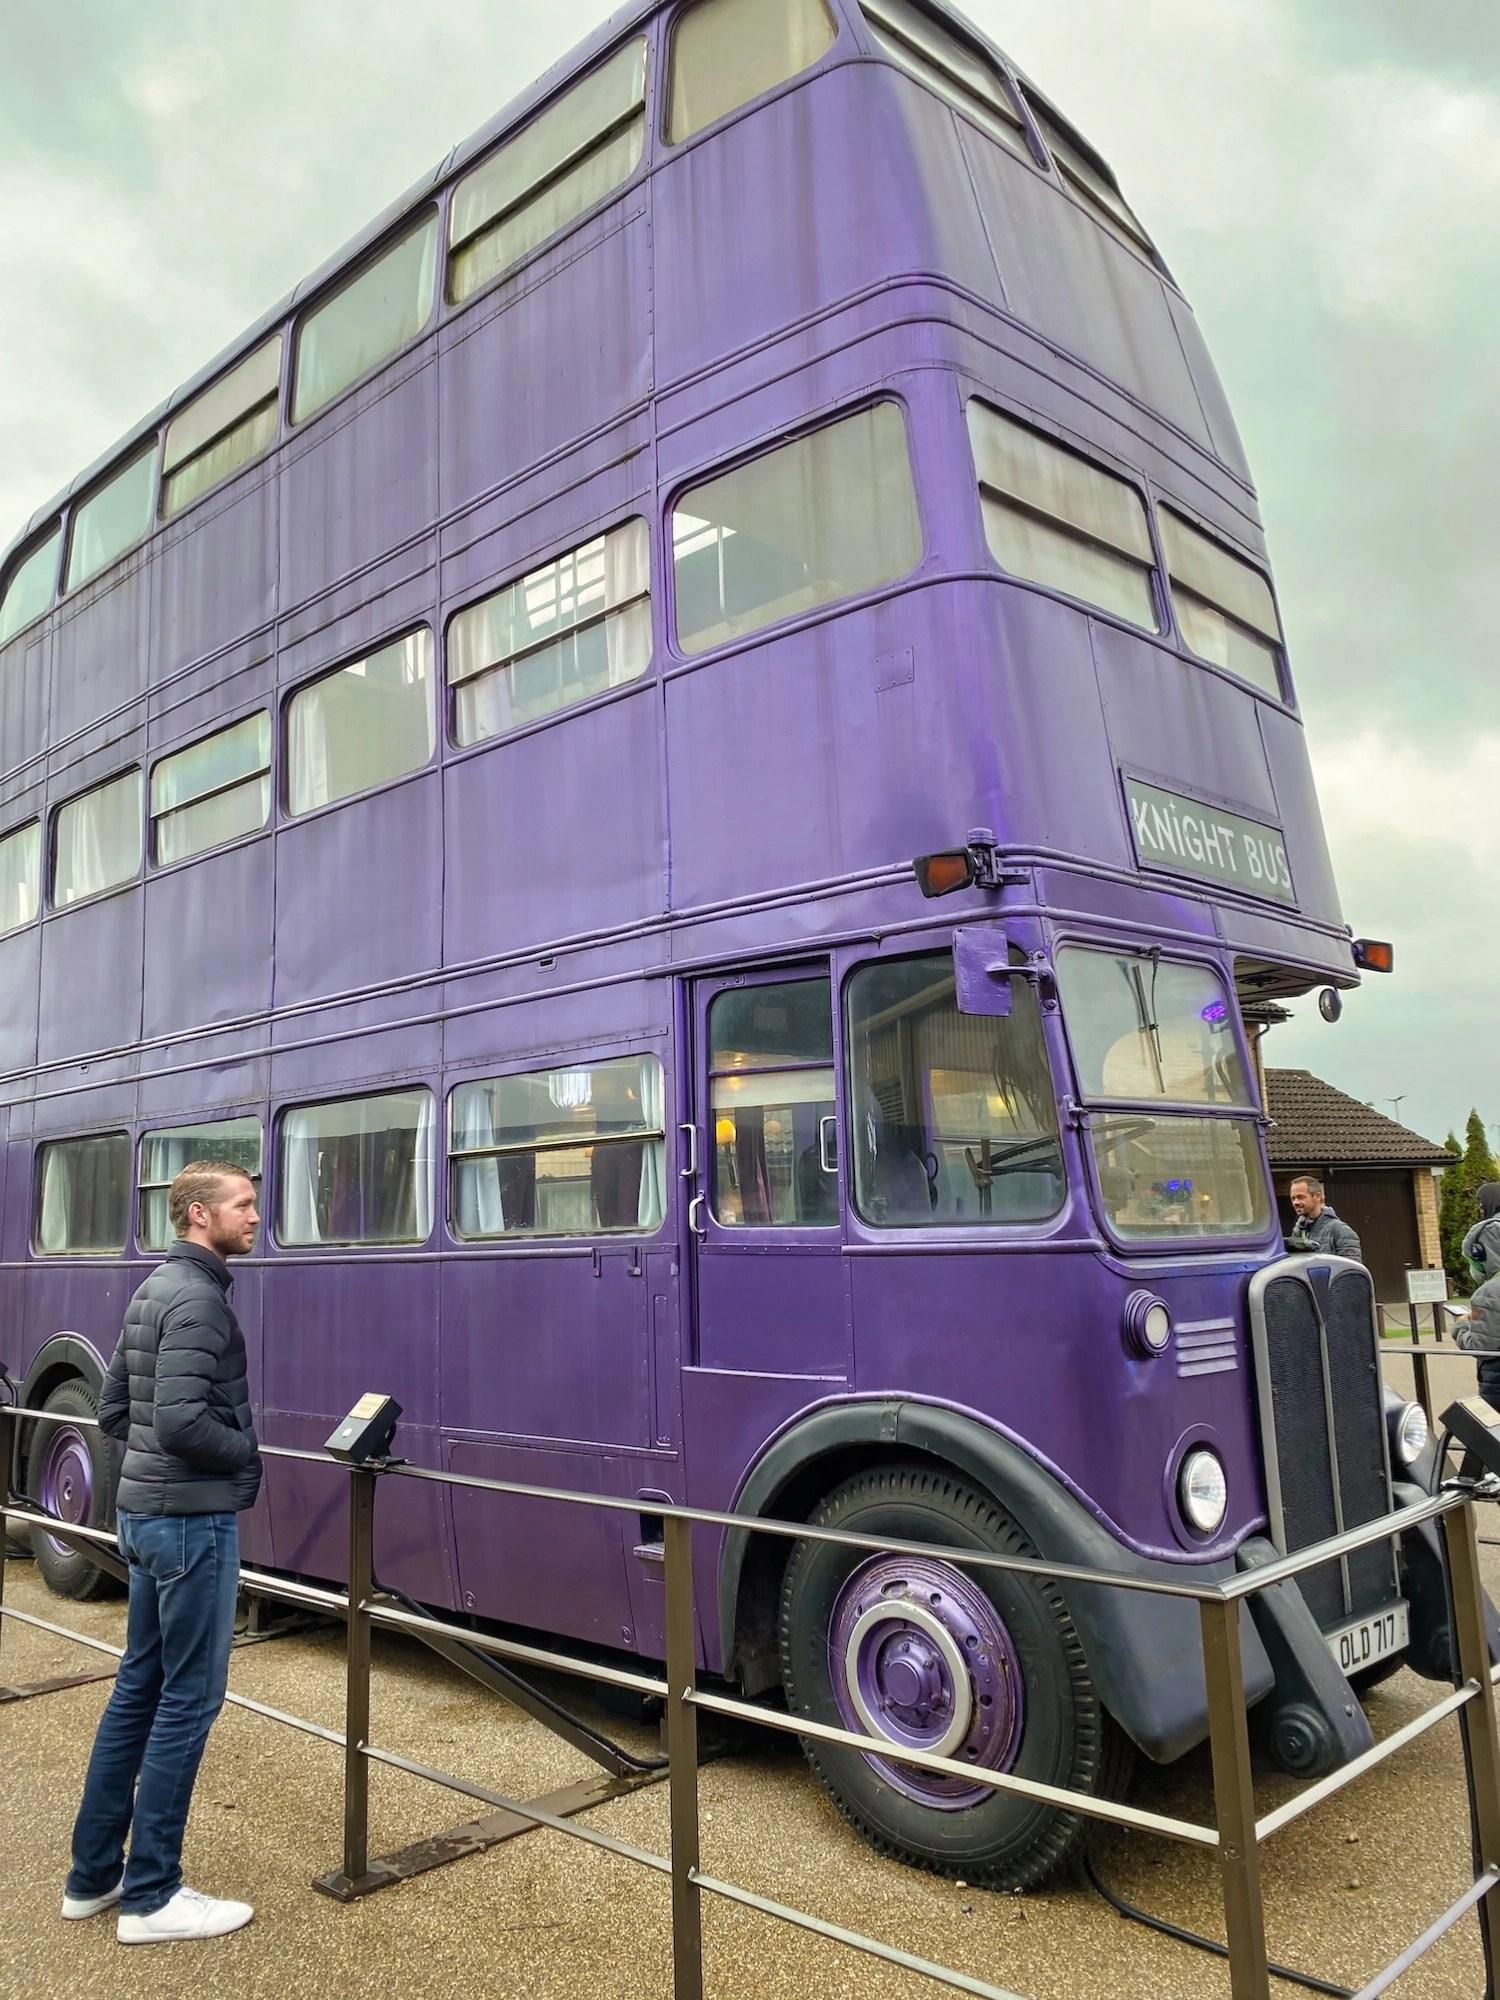 Harry Potter Studio Tour - Backlot - Knight Bus